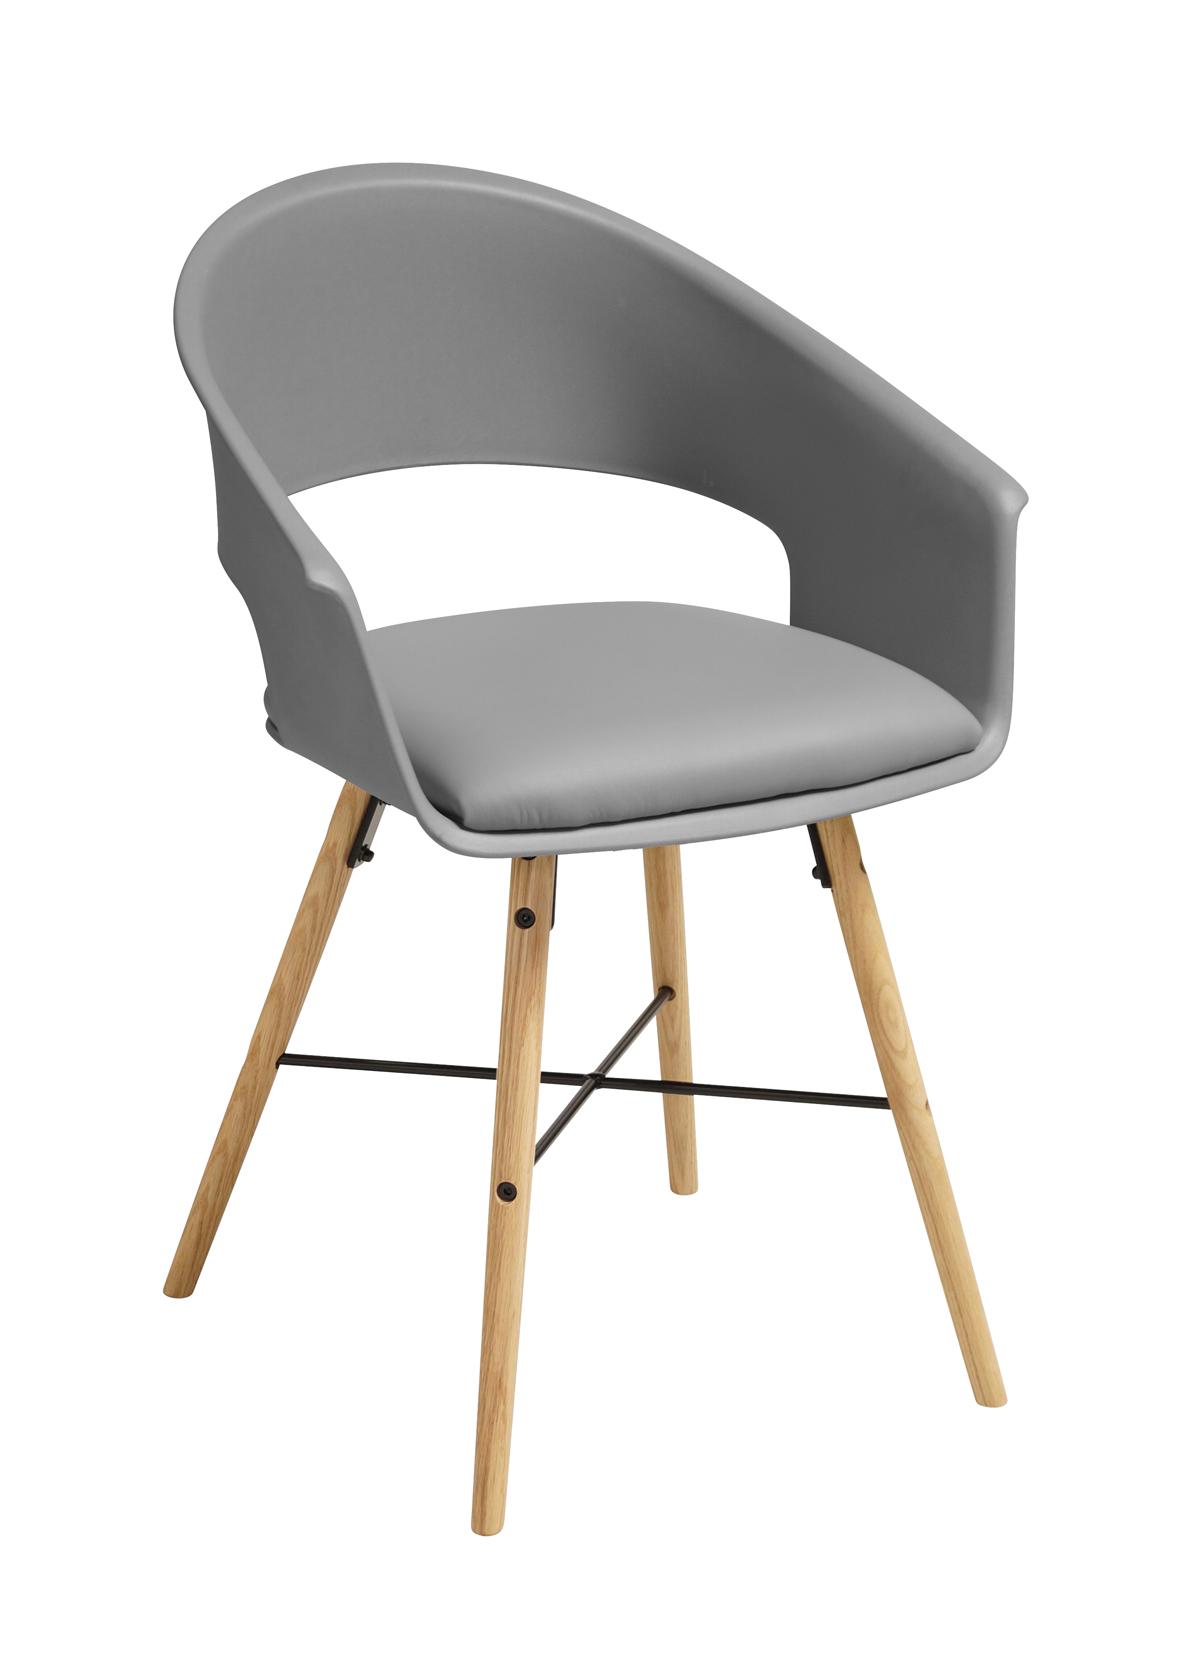 Ivar 10 Spisebordsstol m. grå sæde - Natur